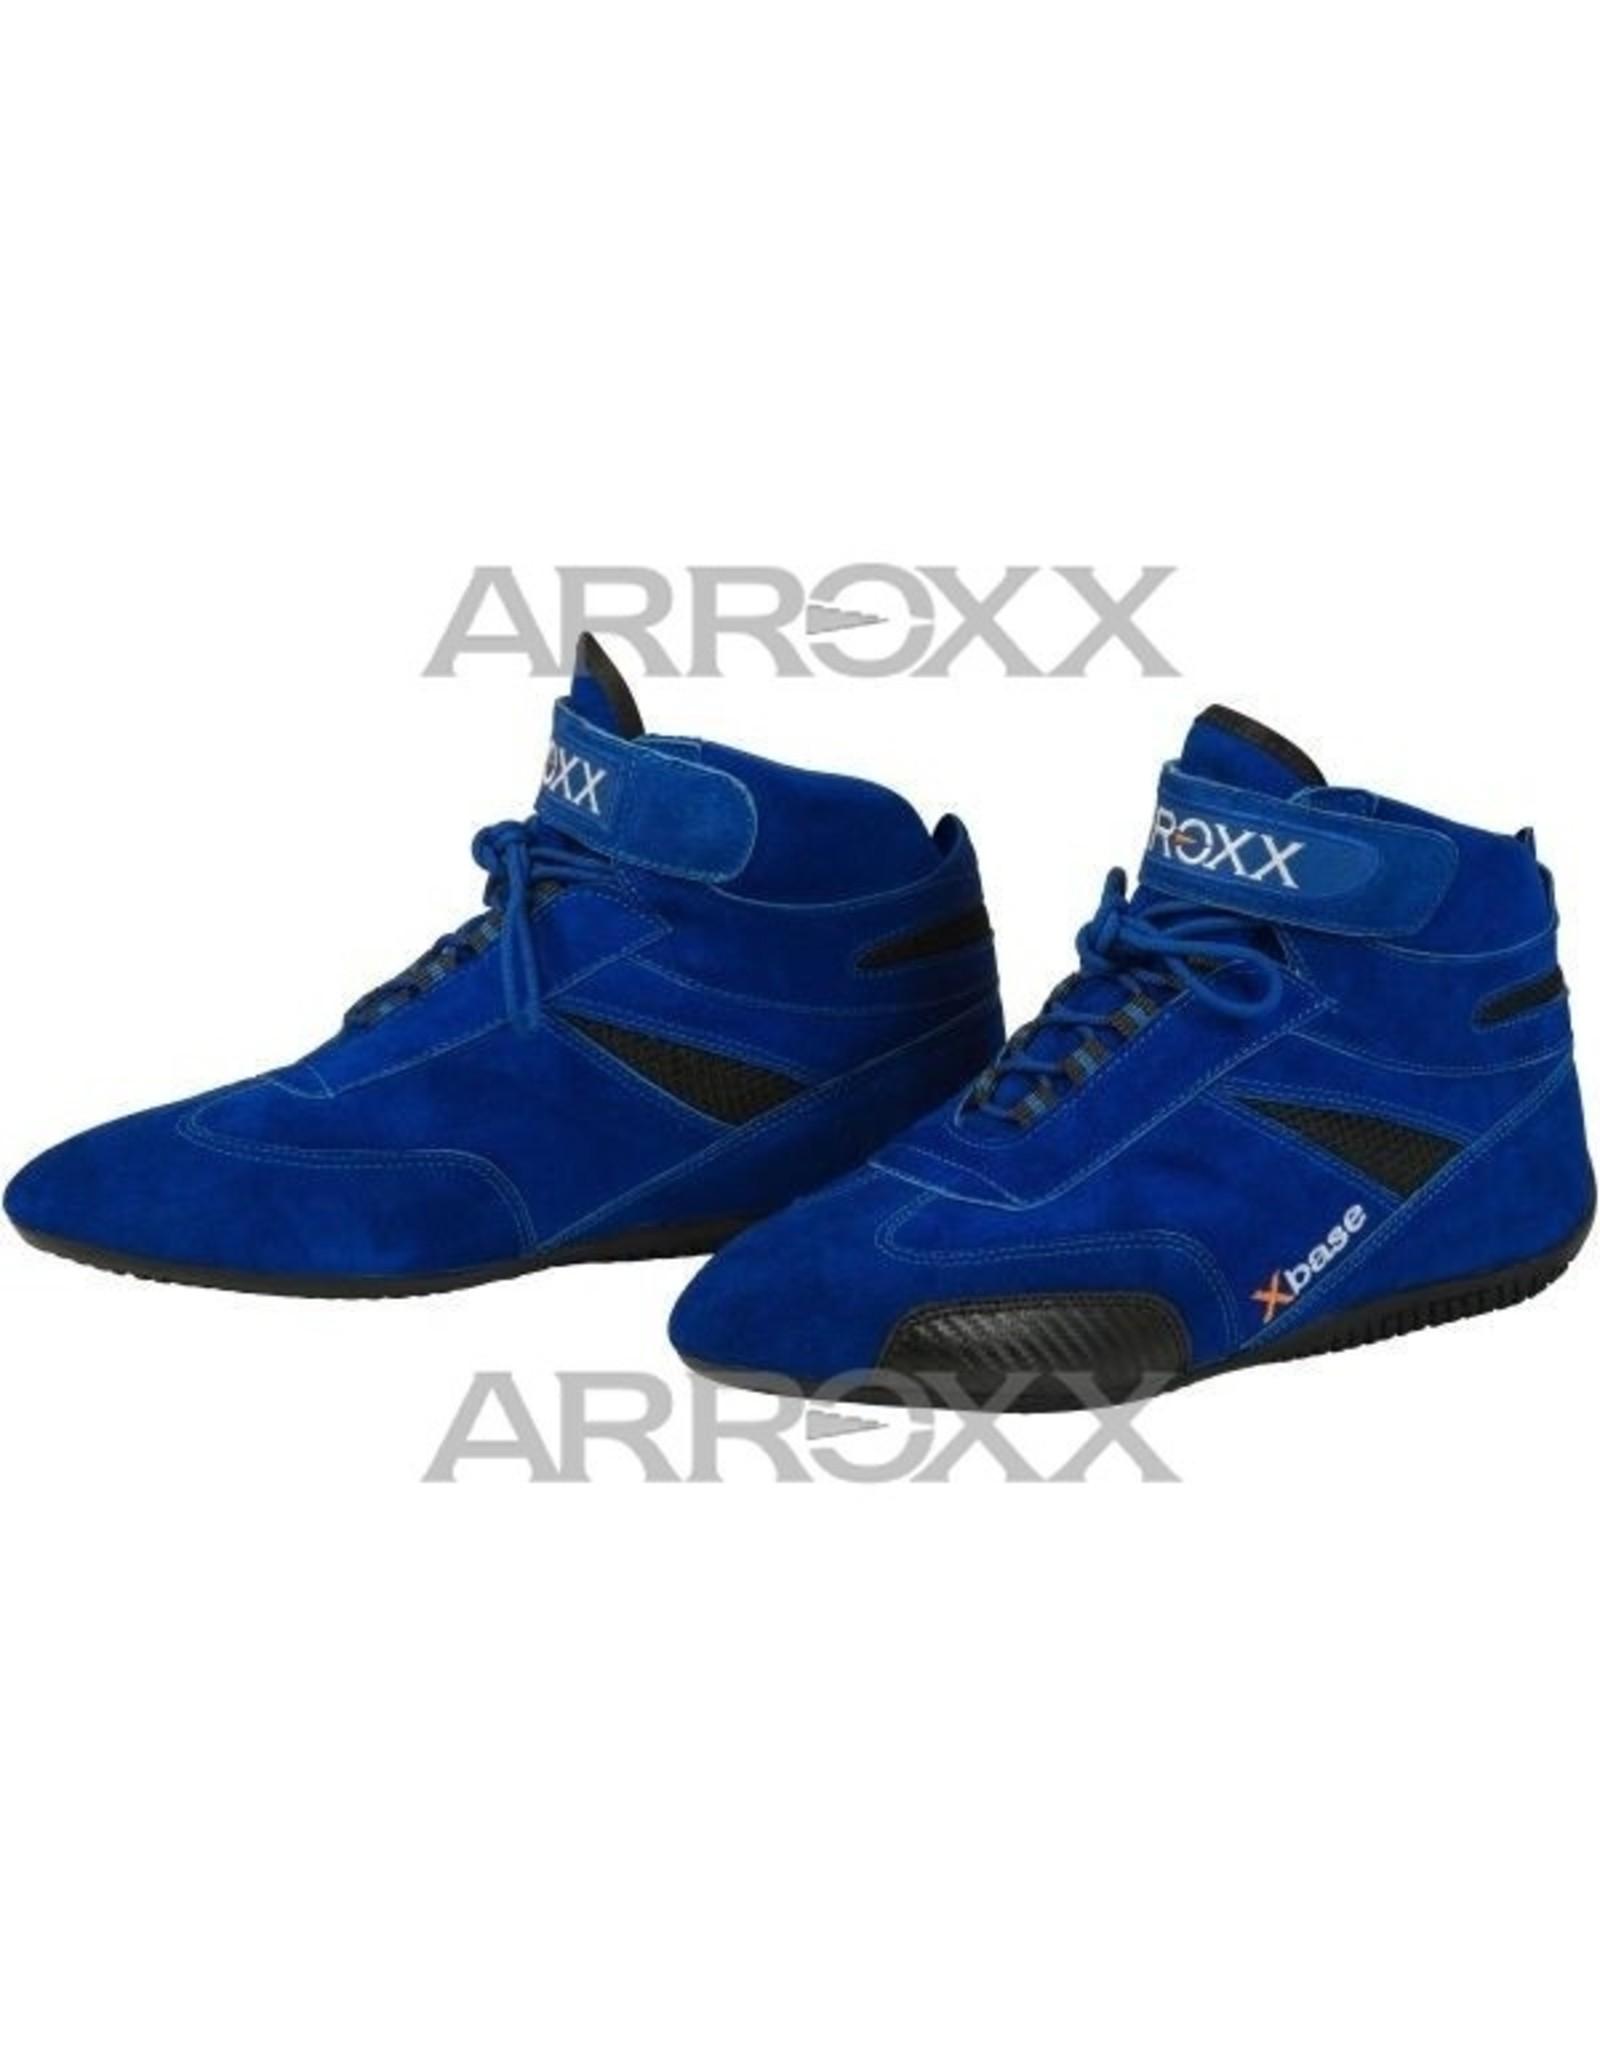 Arroxx Arroxx Xbase Kartschoenen Blauw Leer